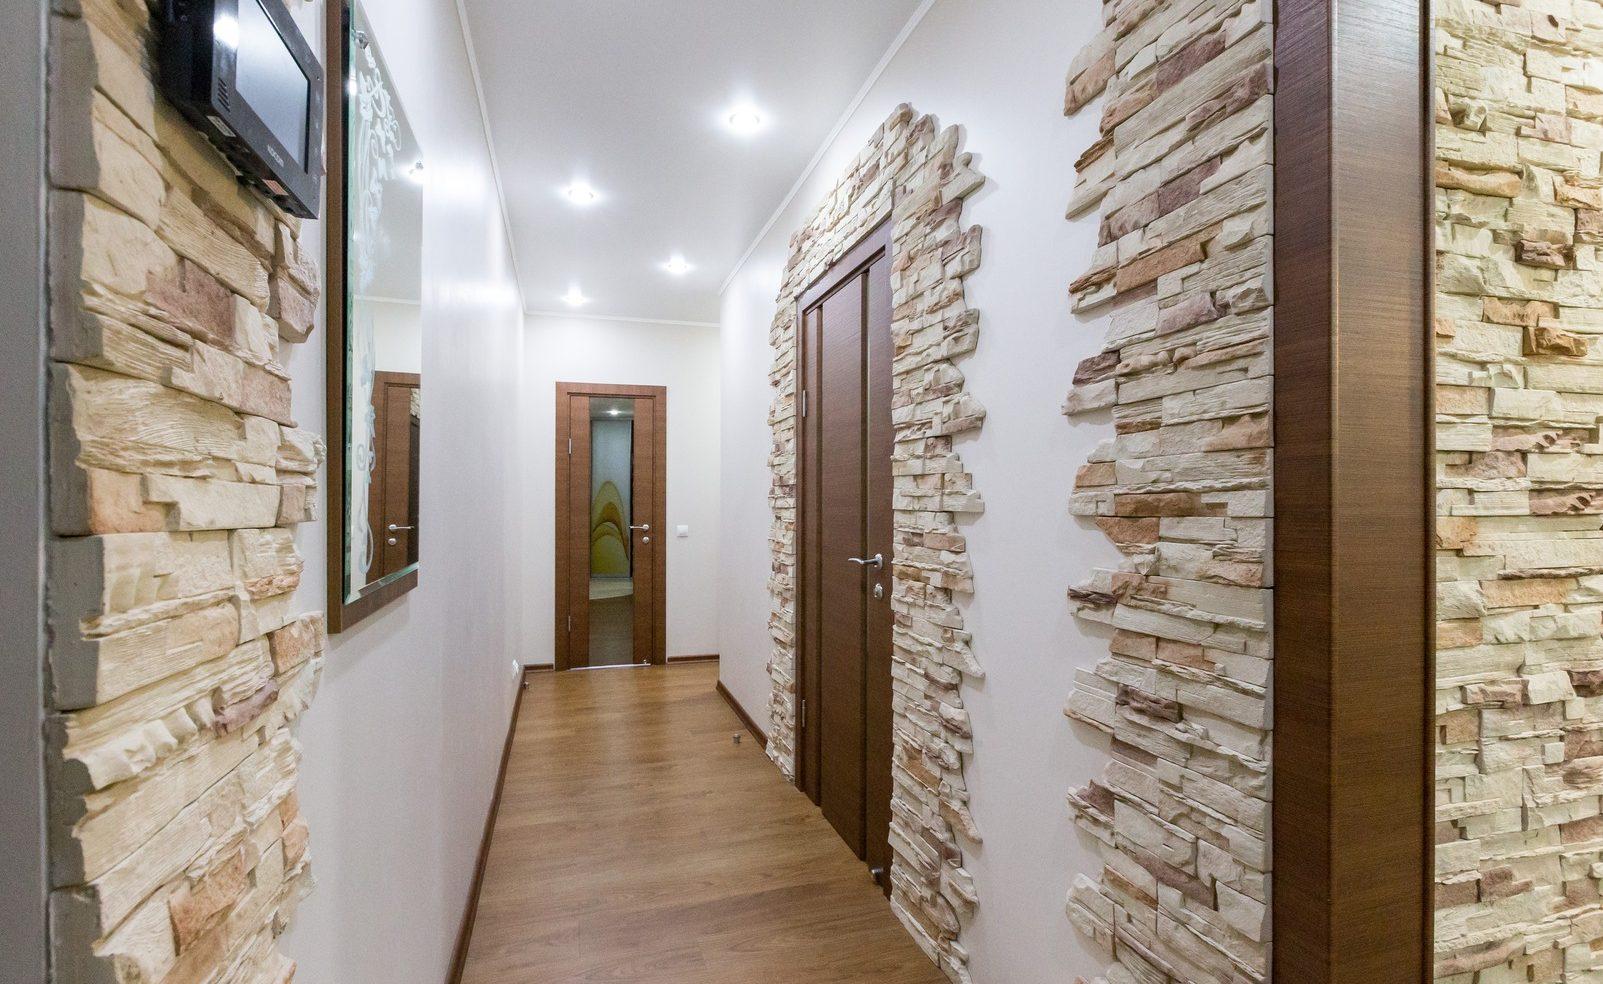 Decorative corner decoration